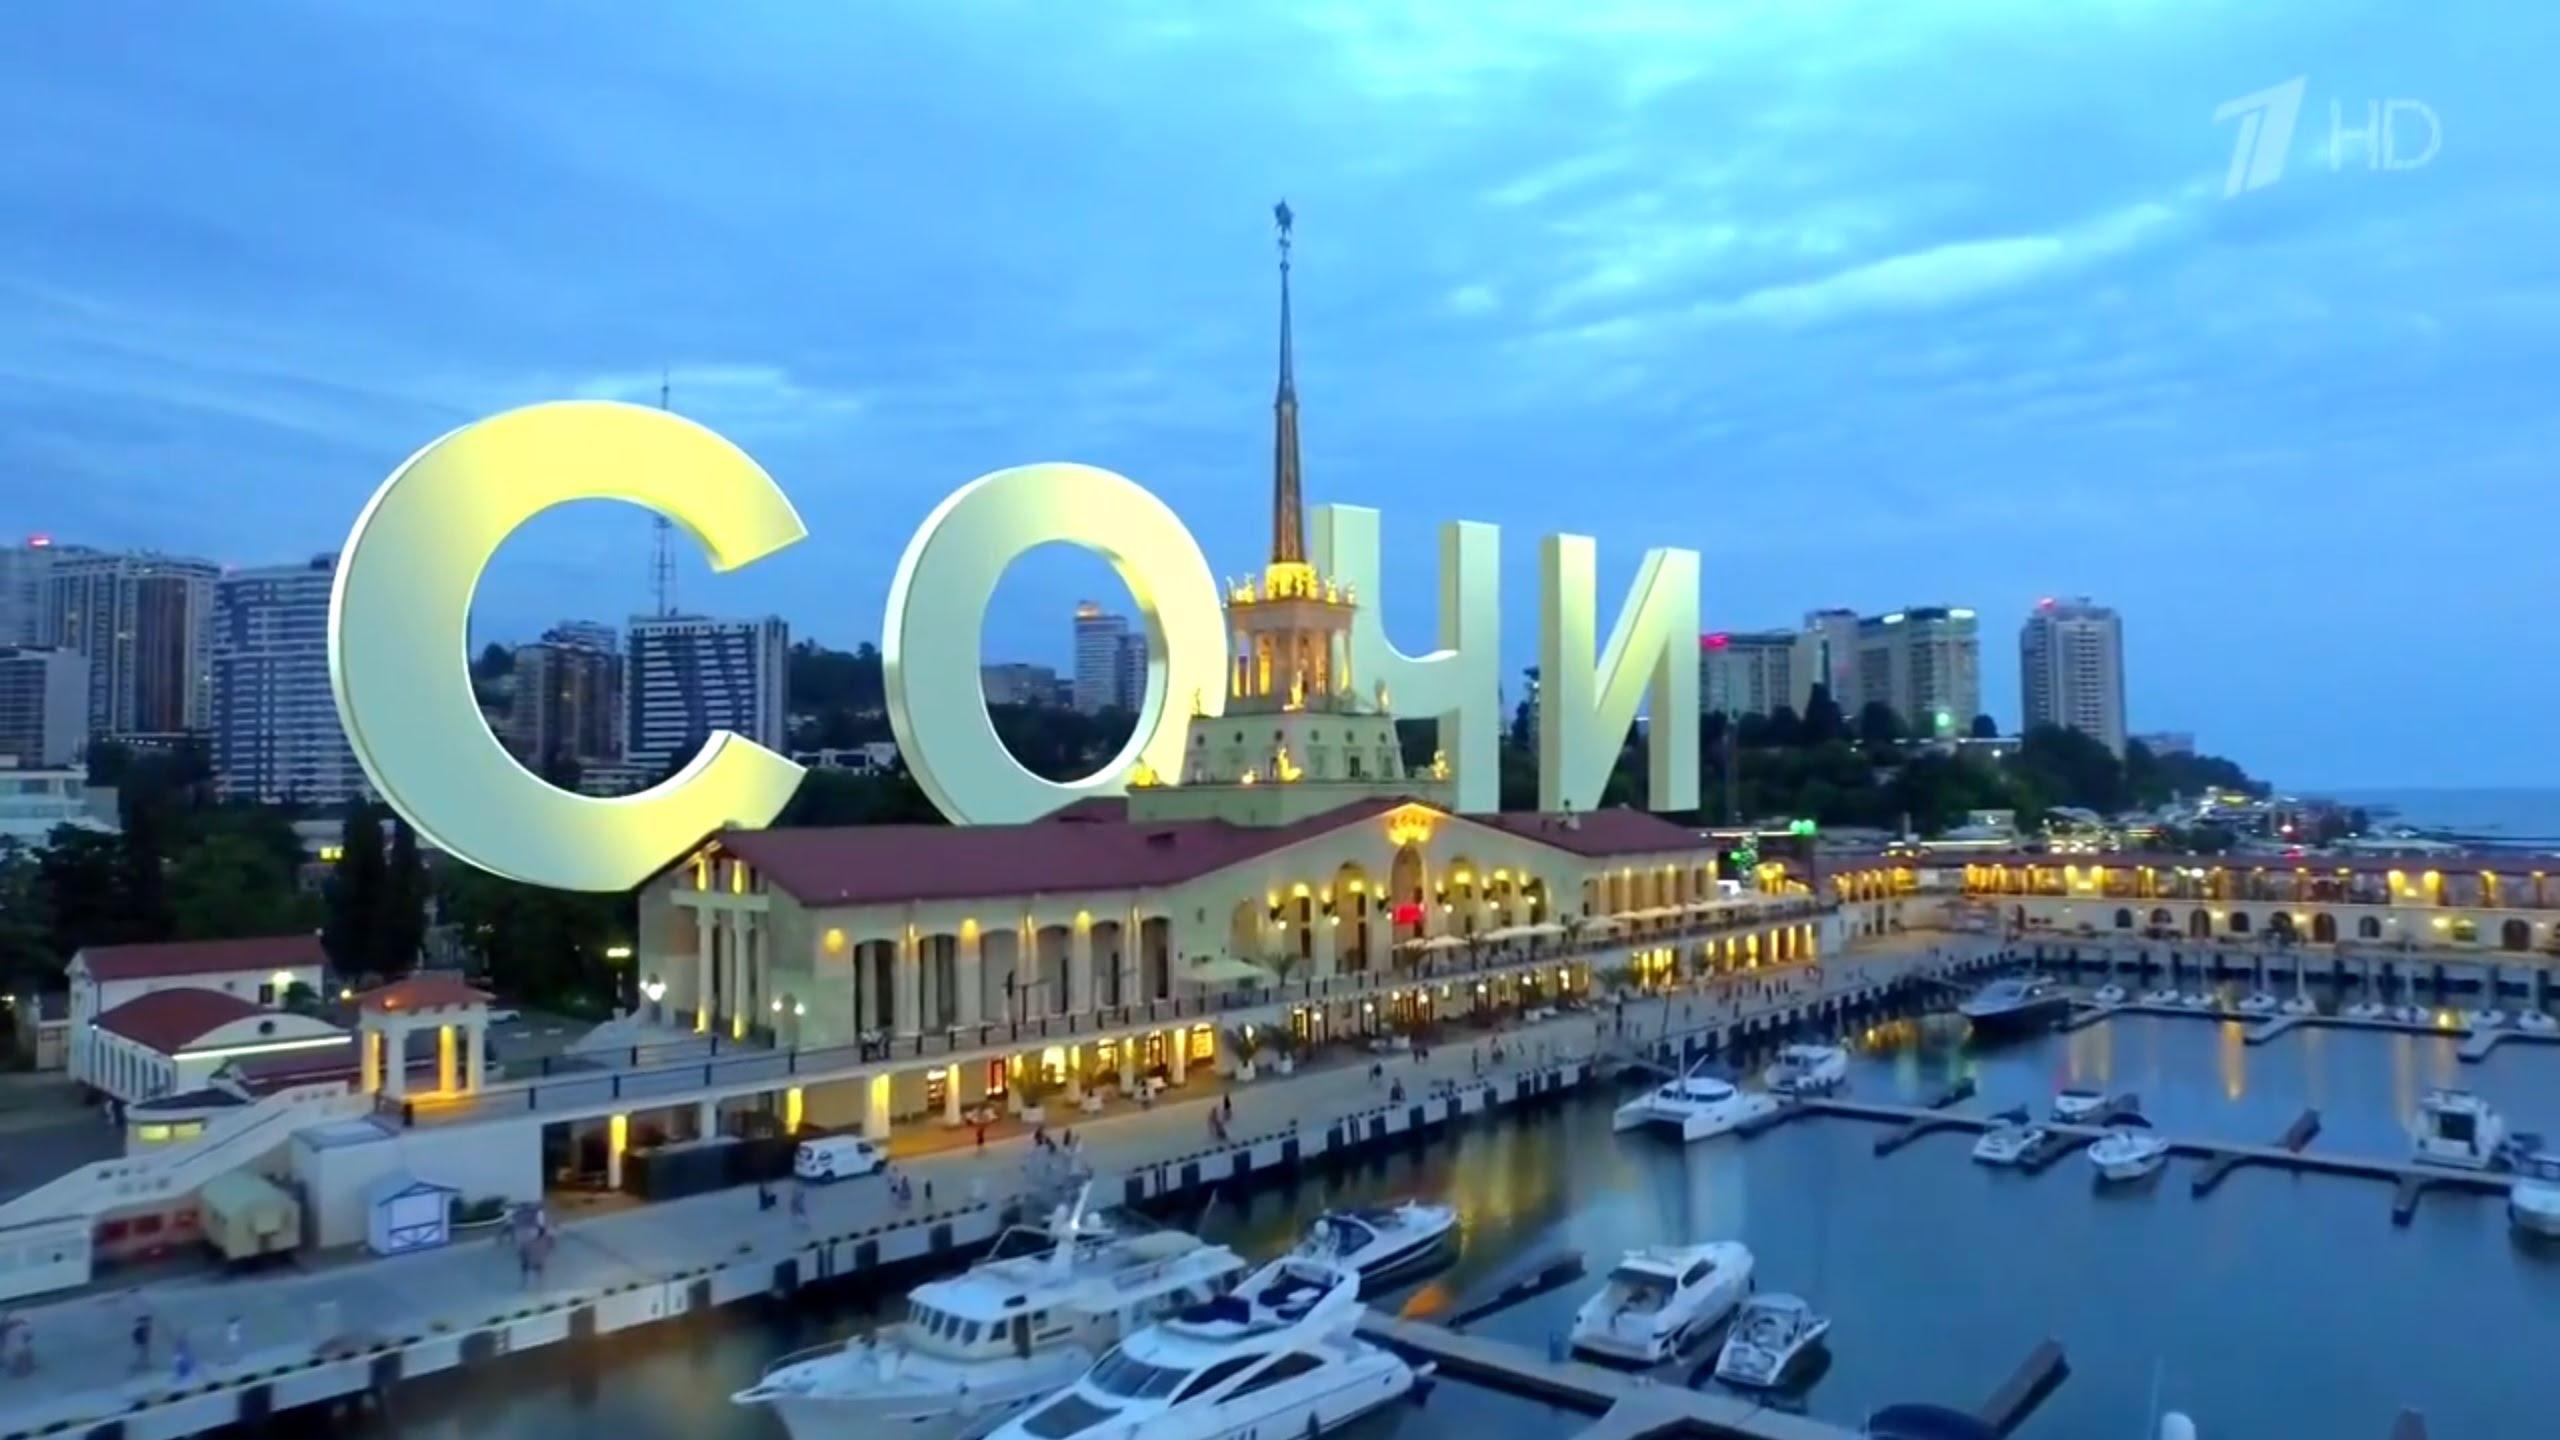 Otdyih v Sochi - Авиабилеты в Анапу и Сочи